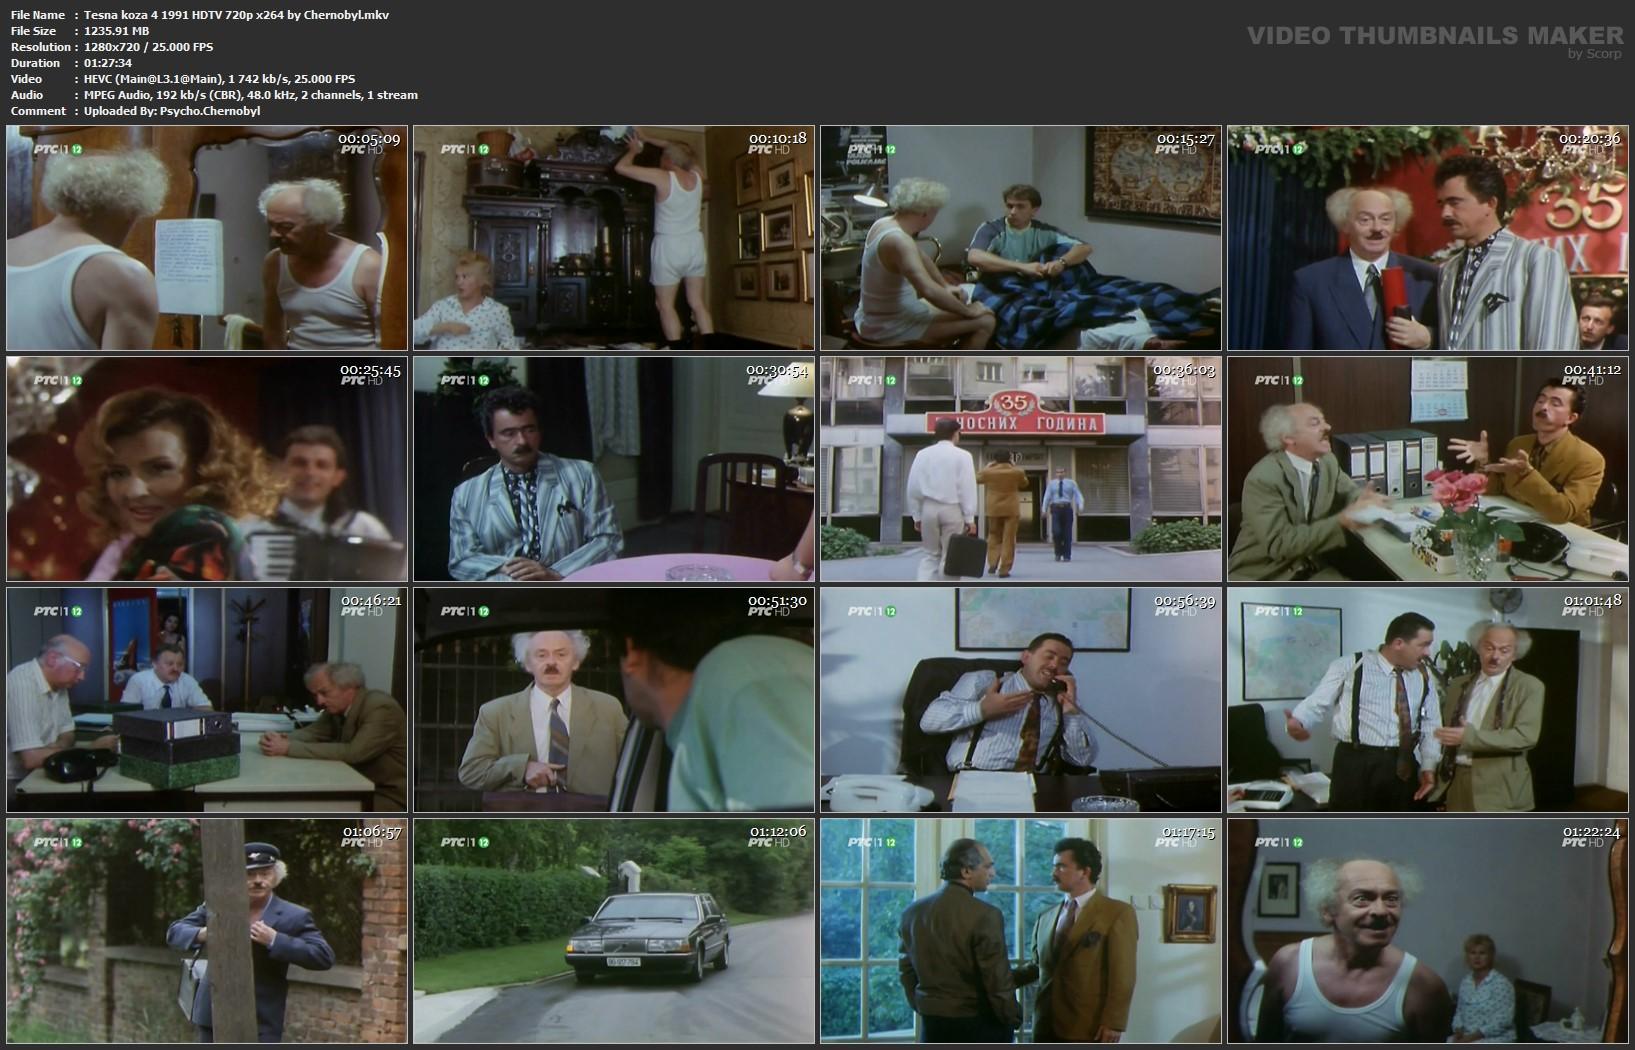 Tesna-koza-4-1991-HDTV-720p-x264-by-Cher